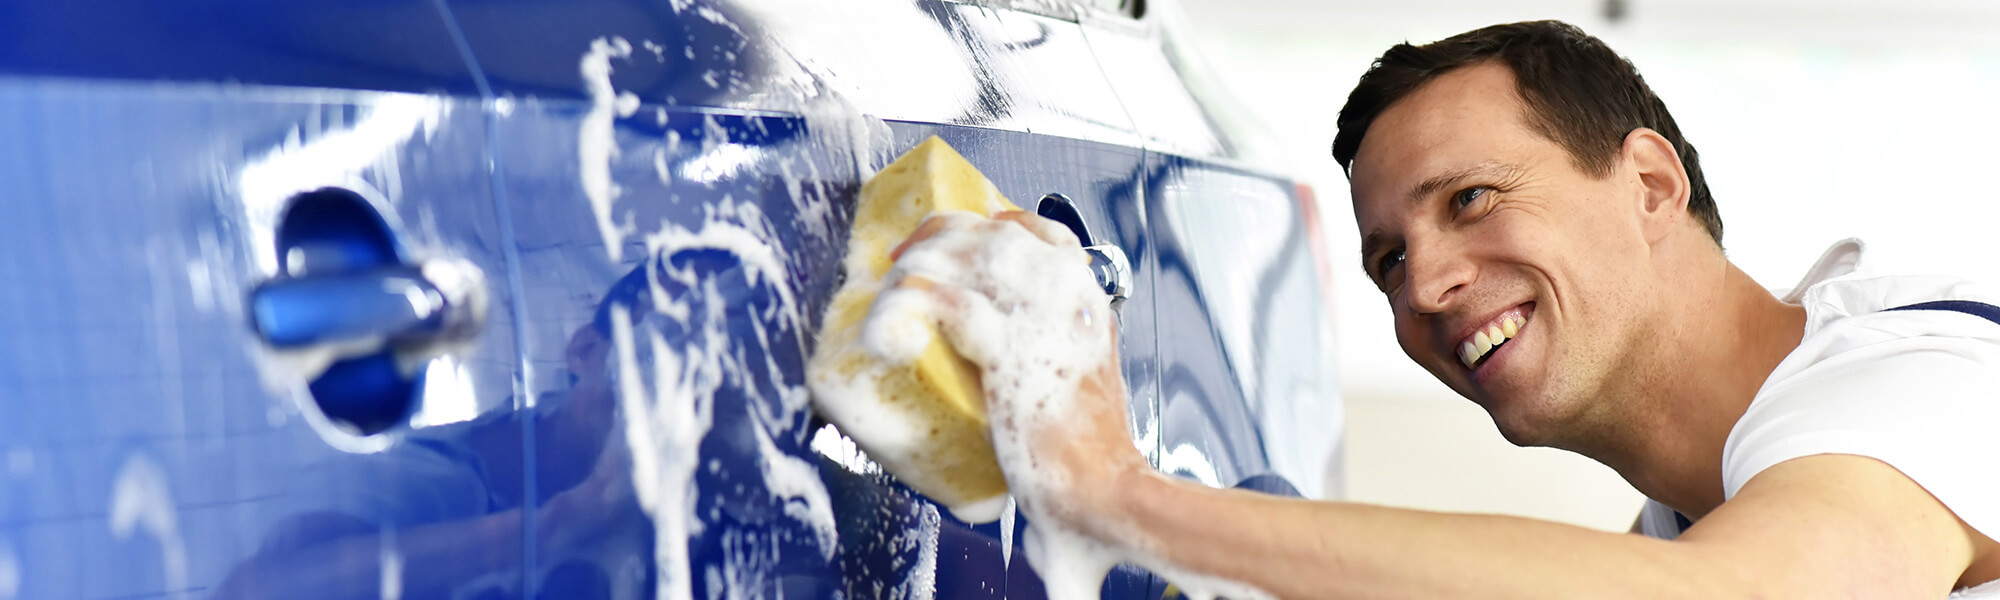 autohaus-ulmen-fahrzeugpflege-und-smart-repair